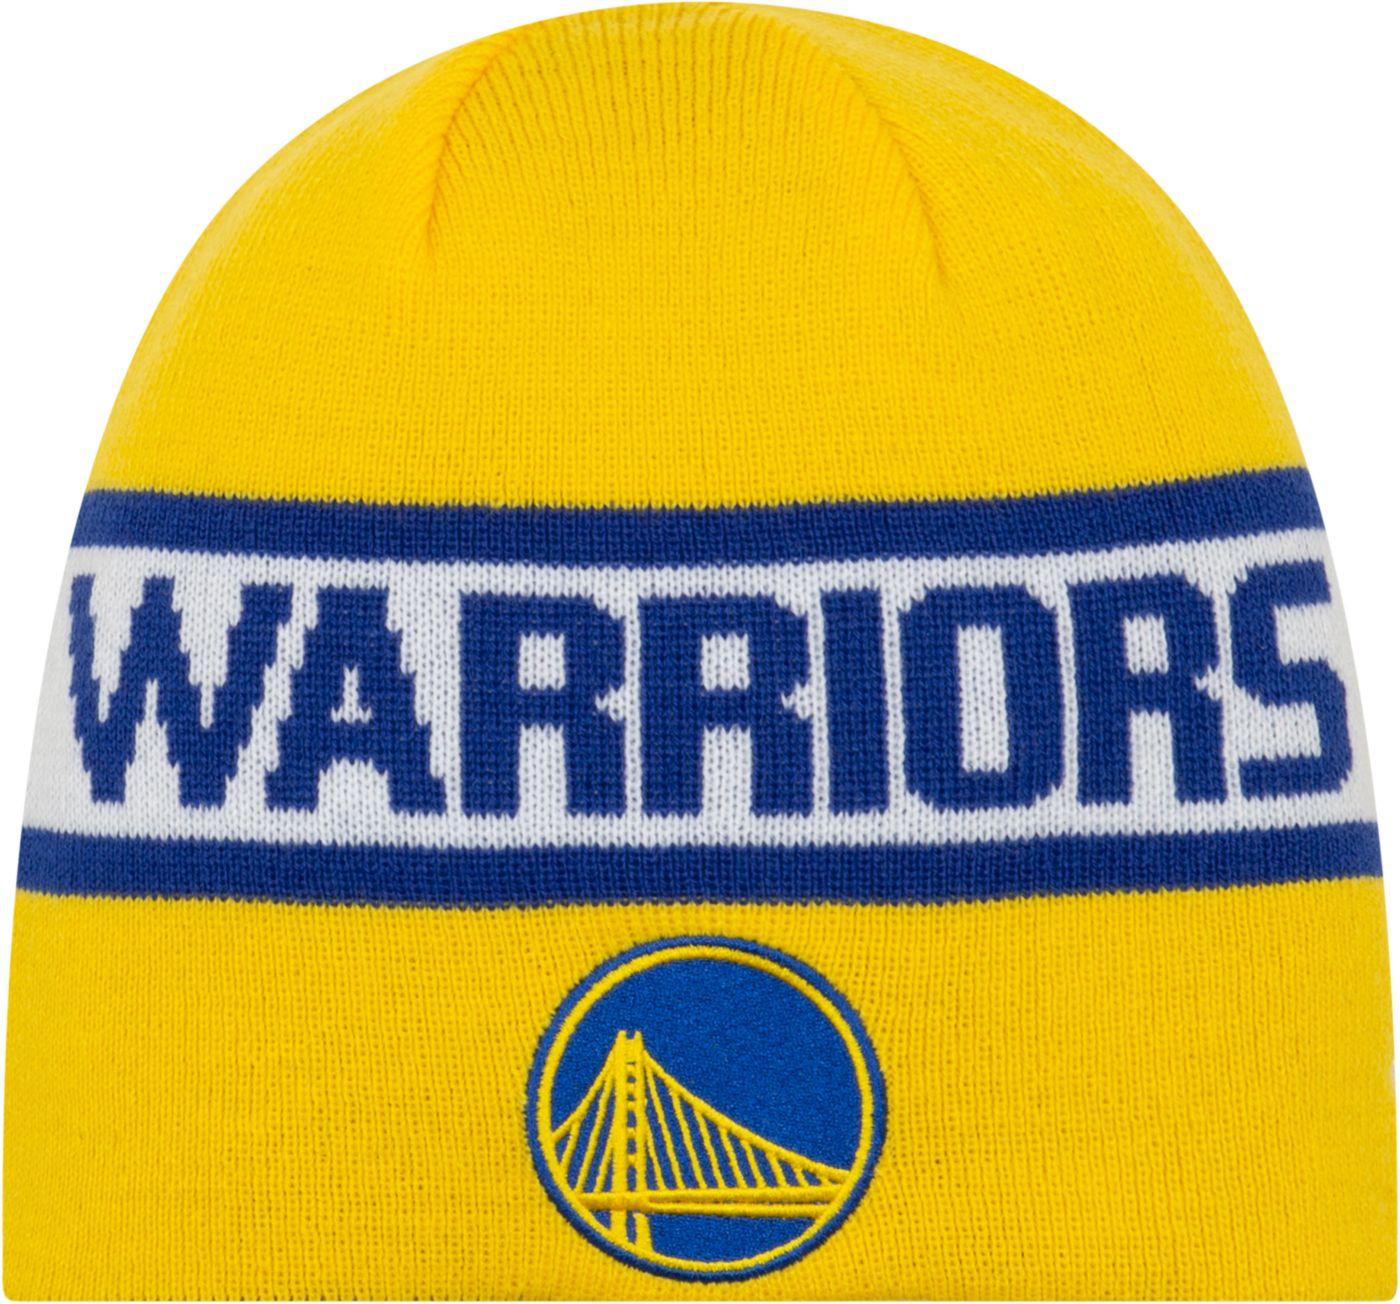 New Era Men's Golden State Warriors Reversible Sports Knit Hat